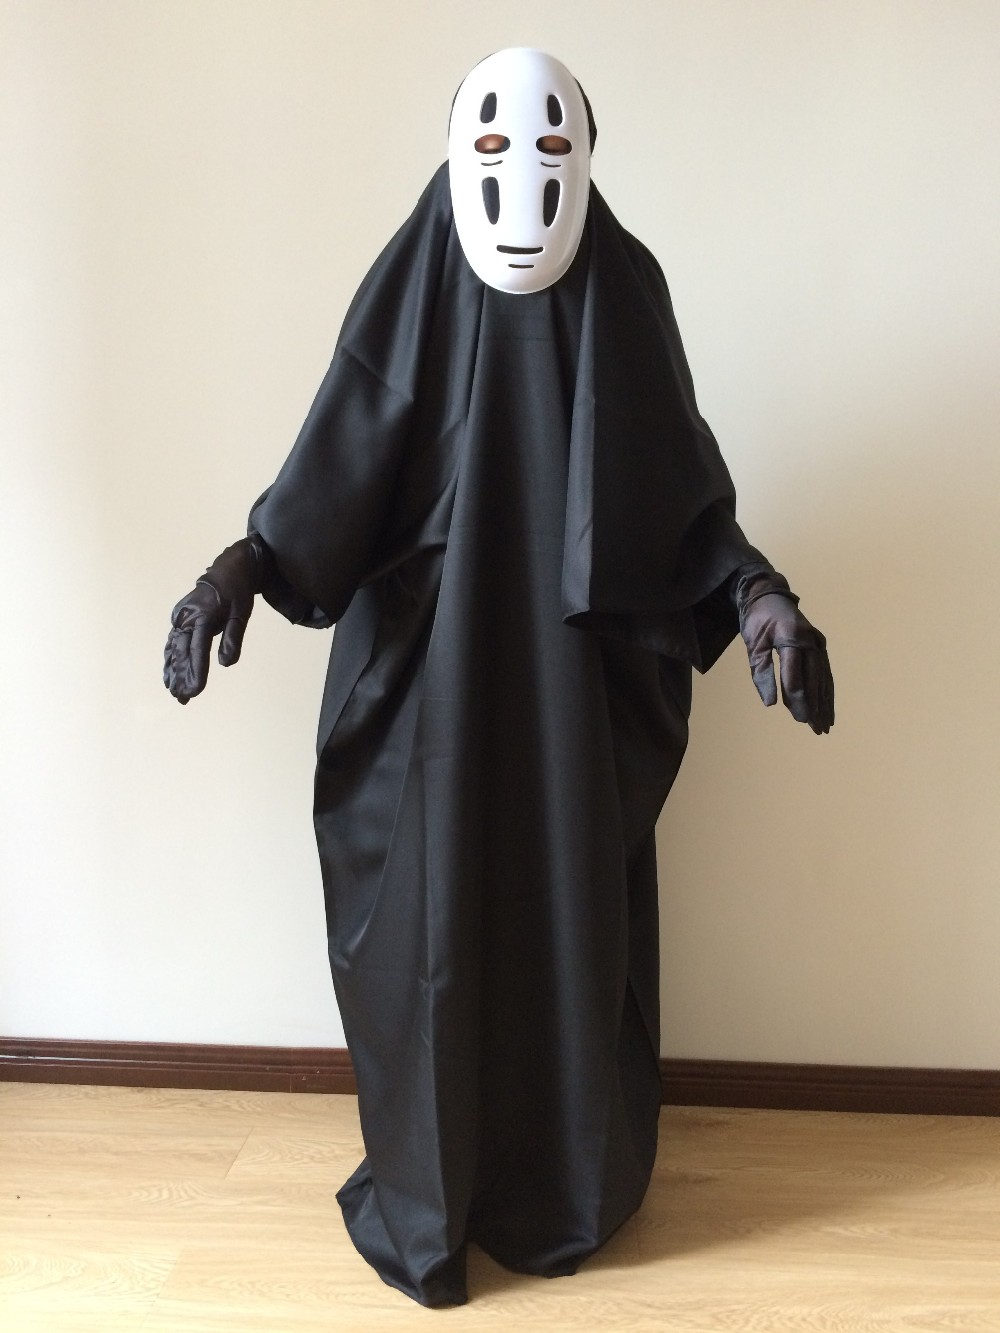 Ghibli Kaonashi Studio Halloween Spirited Away Cosplay No Face Costume Faceless Costume Costume Costumes Halloween Costumescostume On Halloween Aliexpress